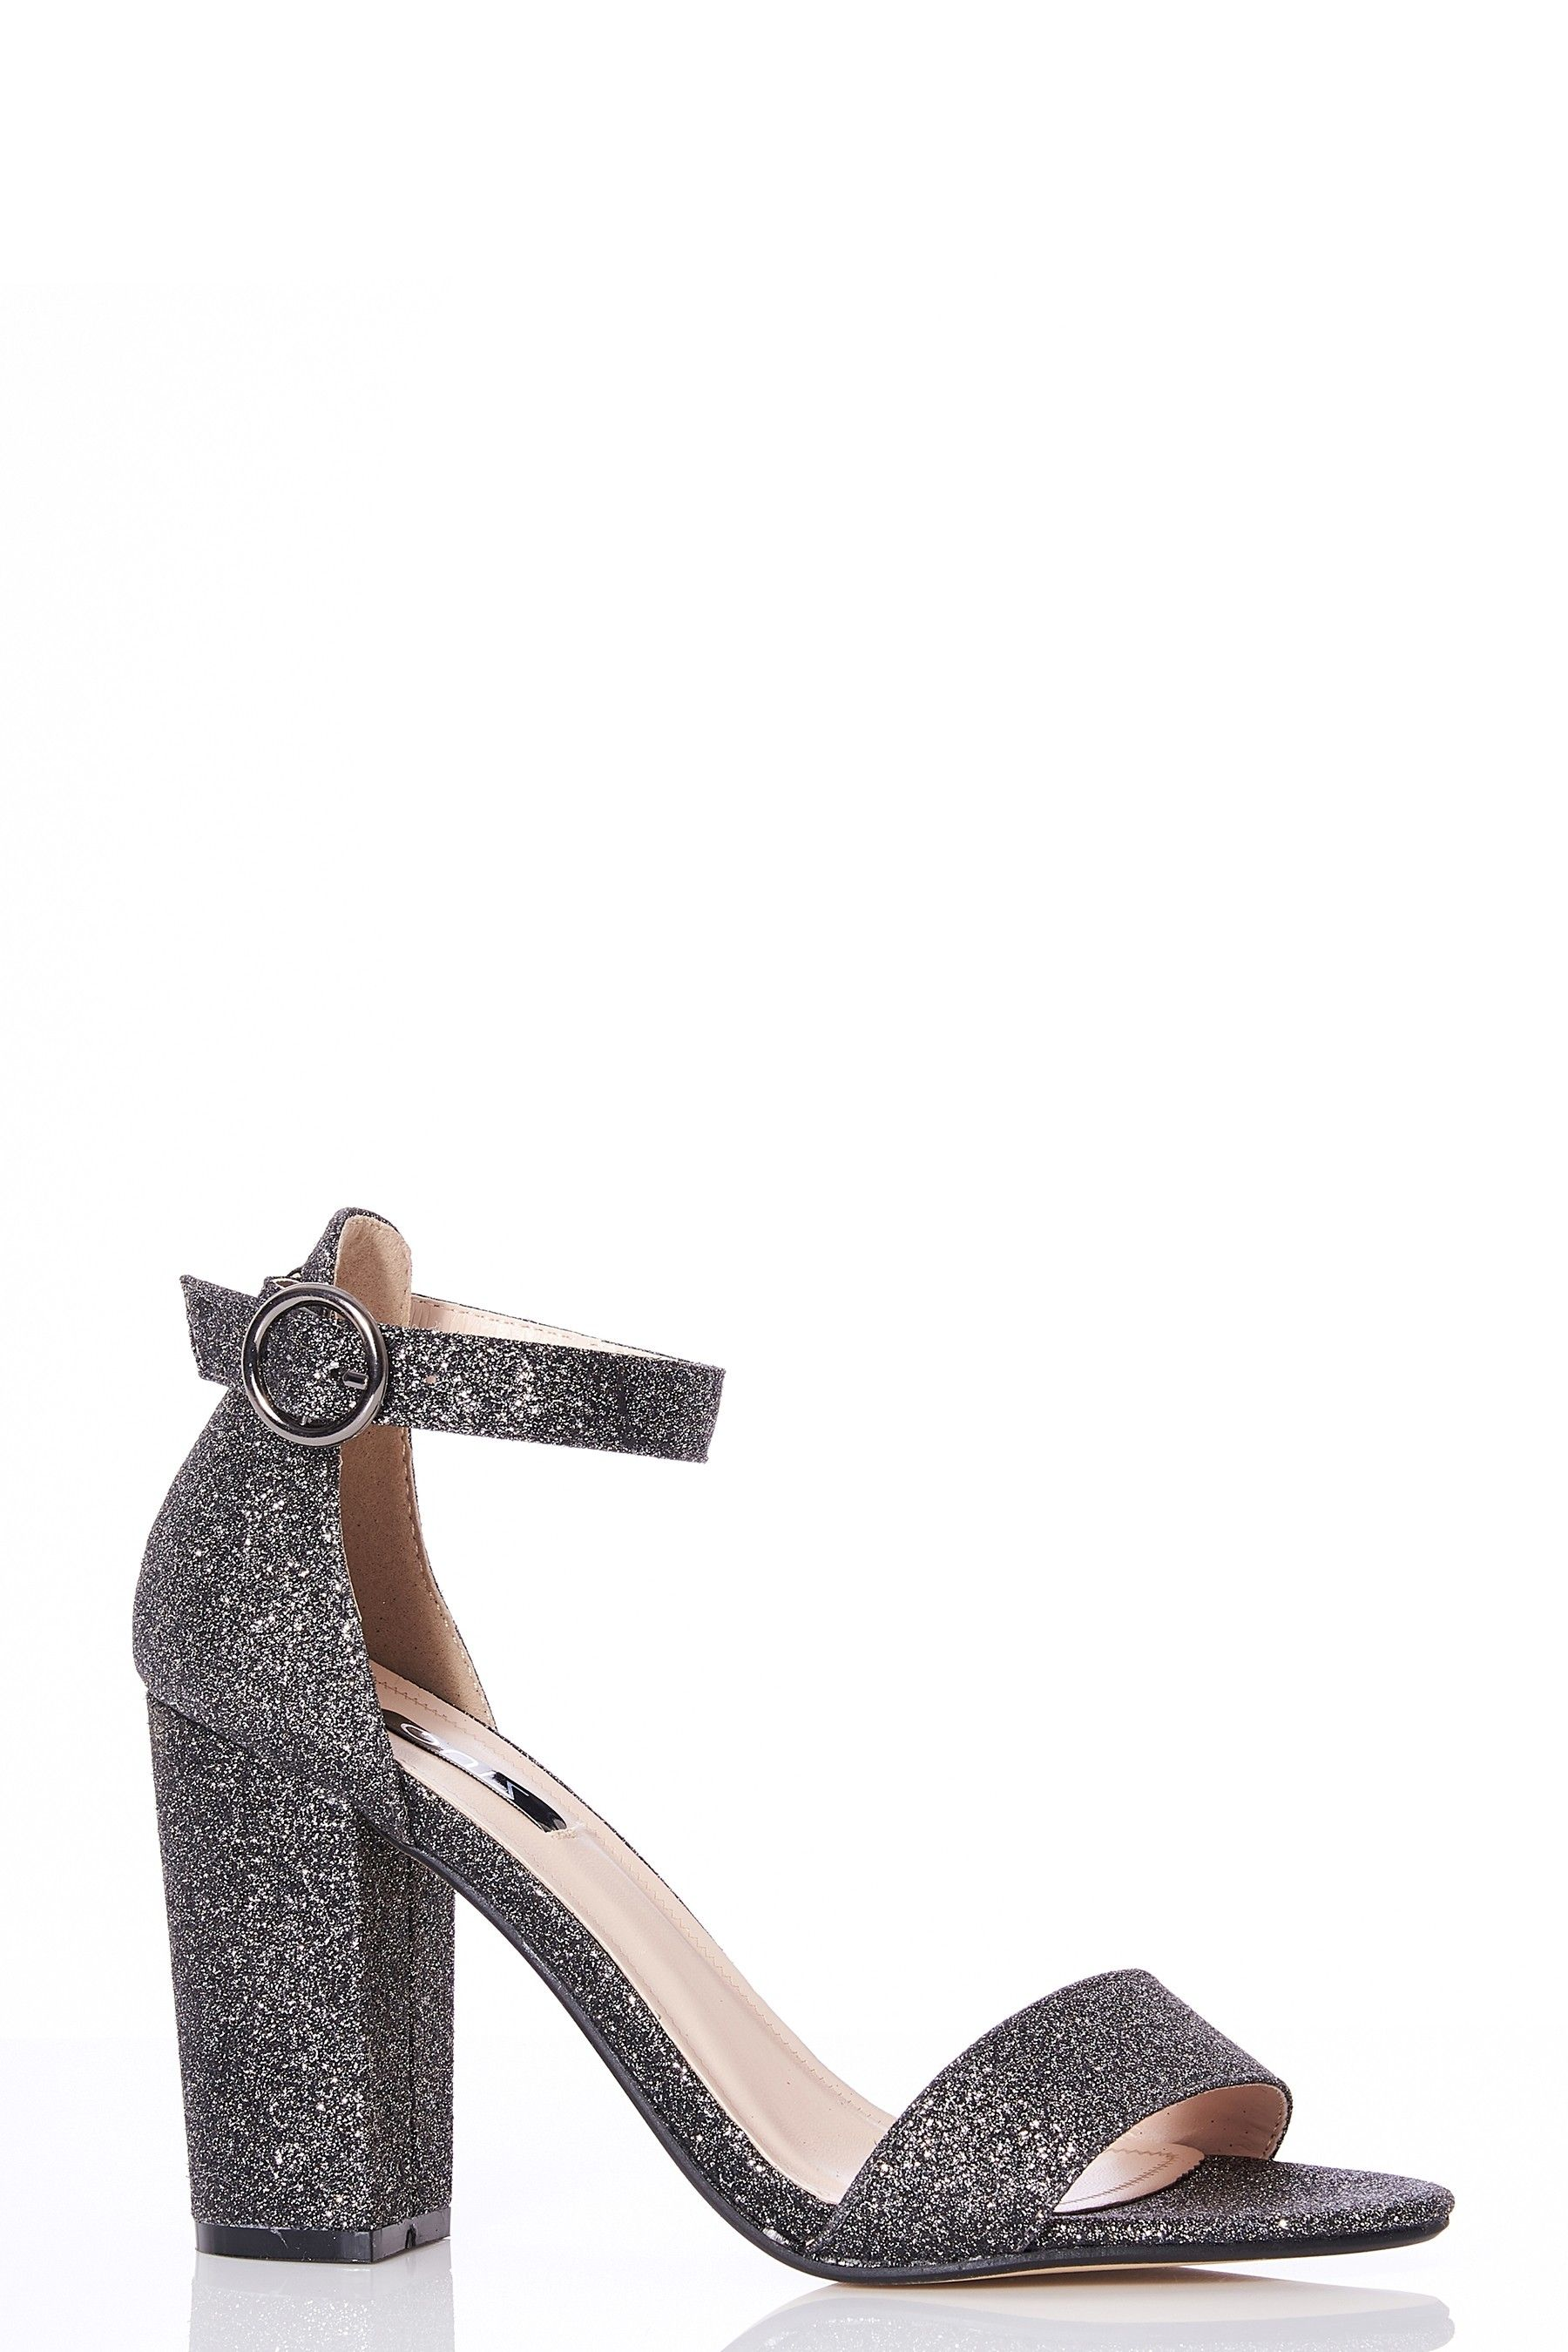 48acc5aeea3 Womens Quiz Glitter Block Heels - Grey